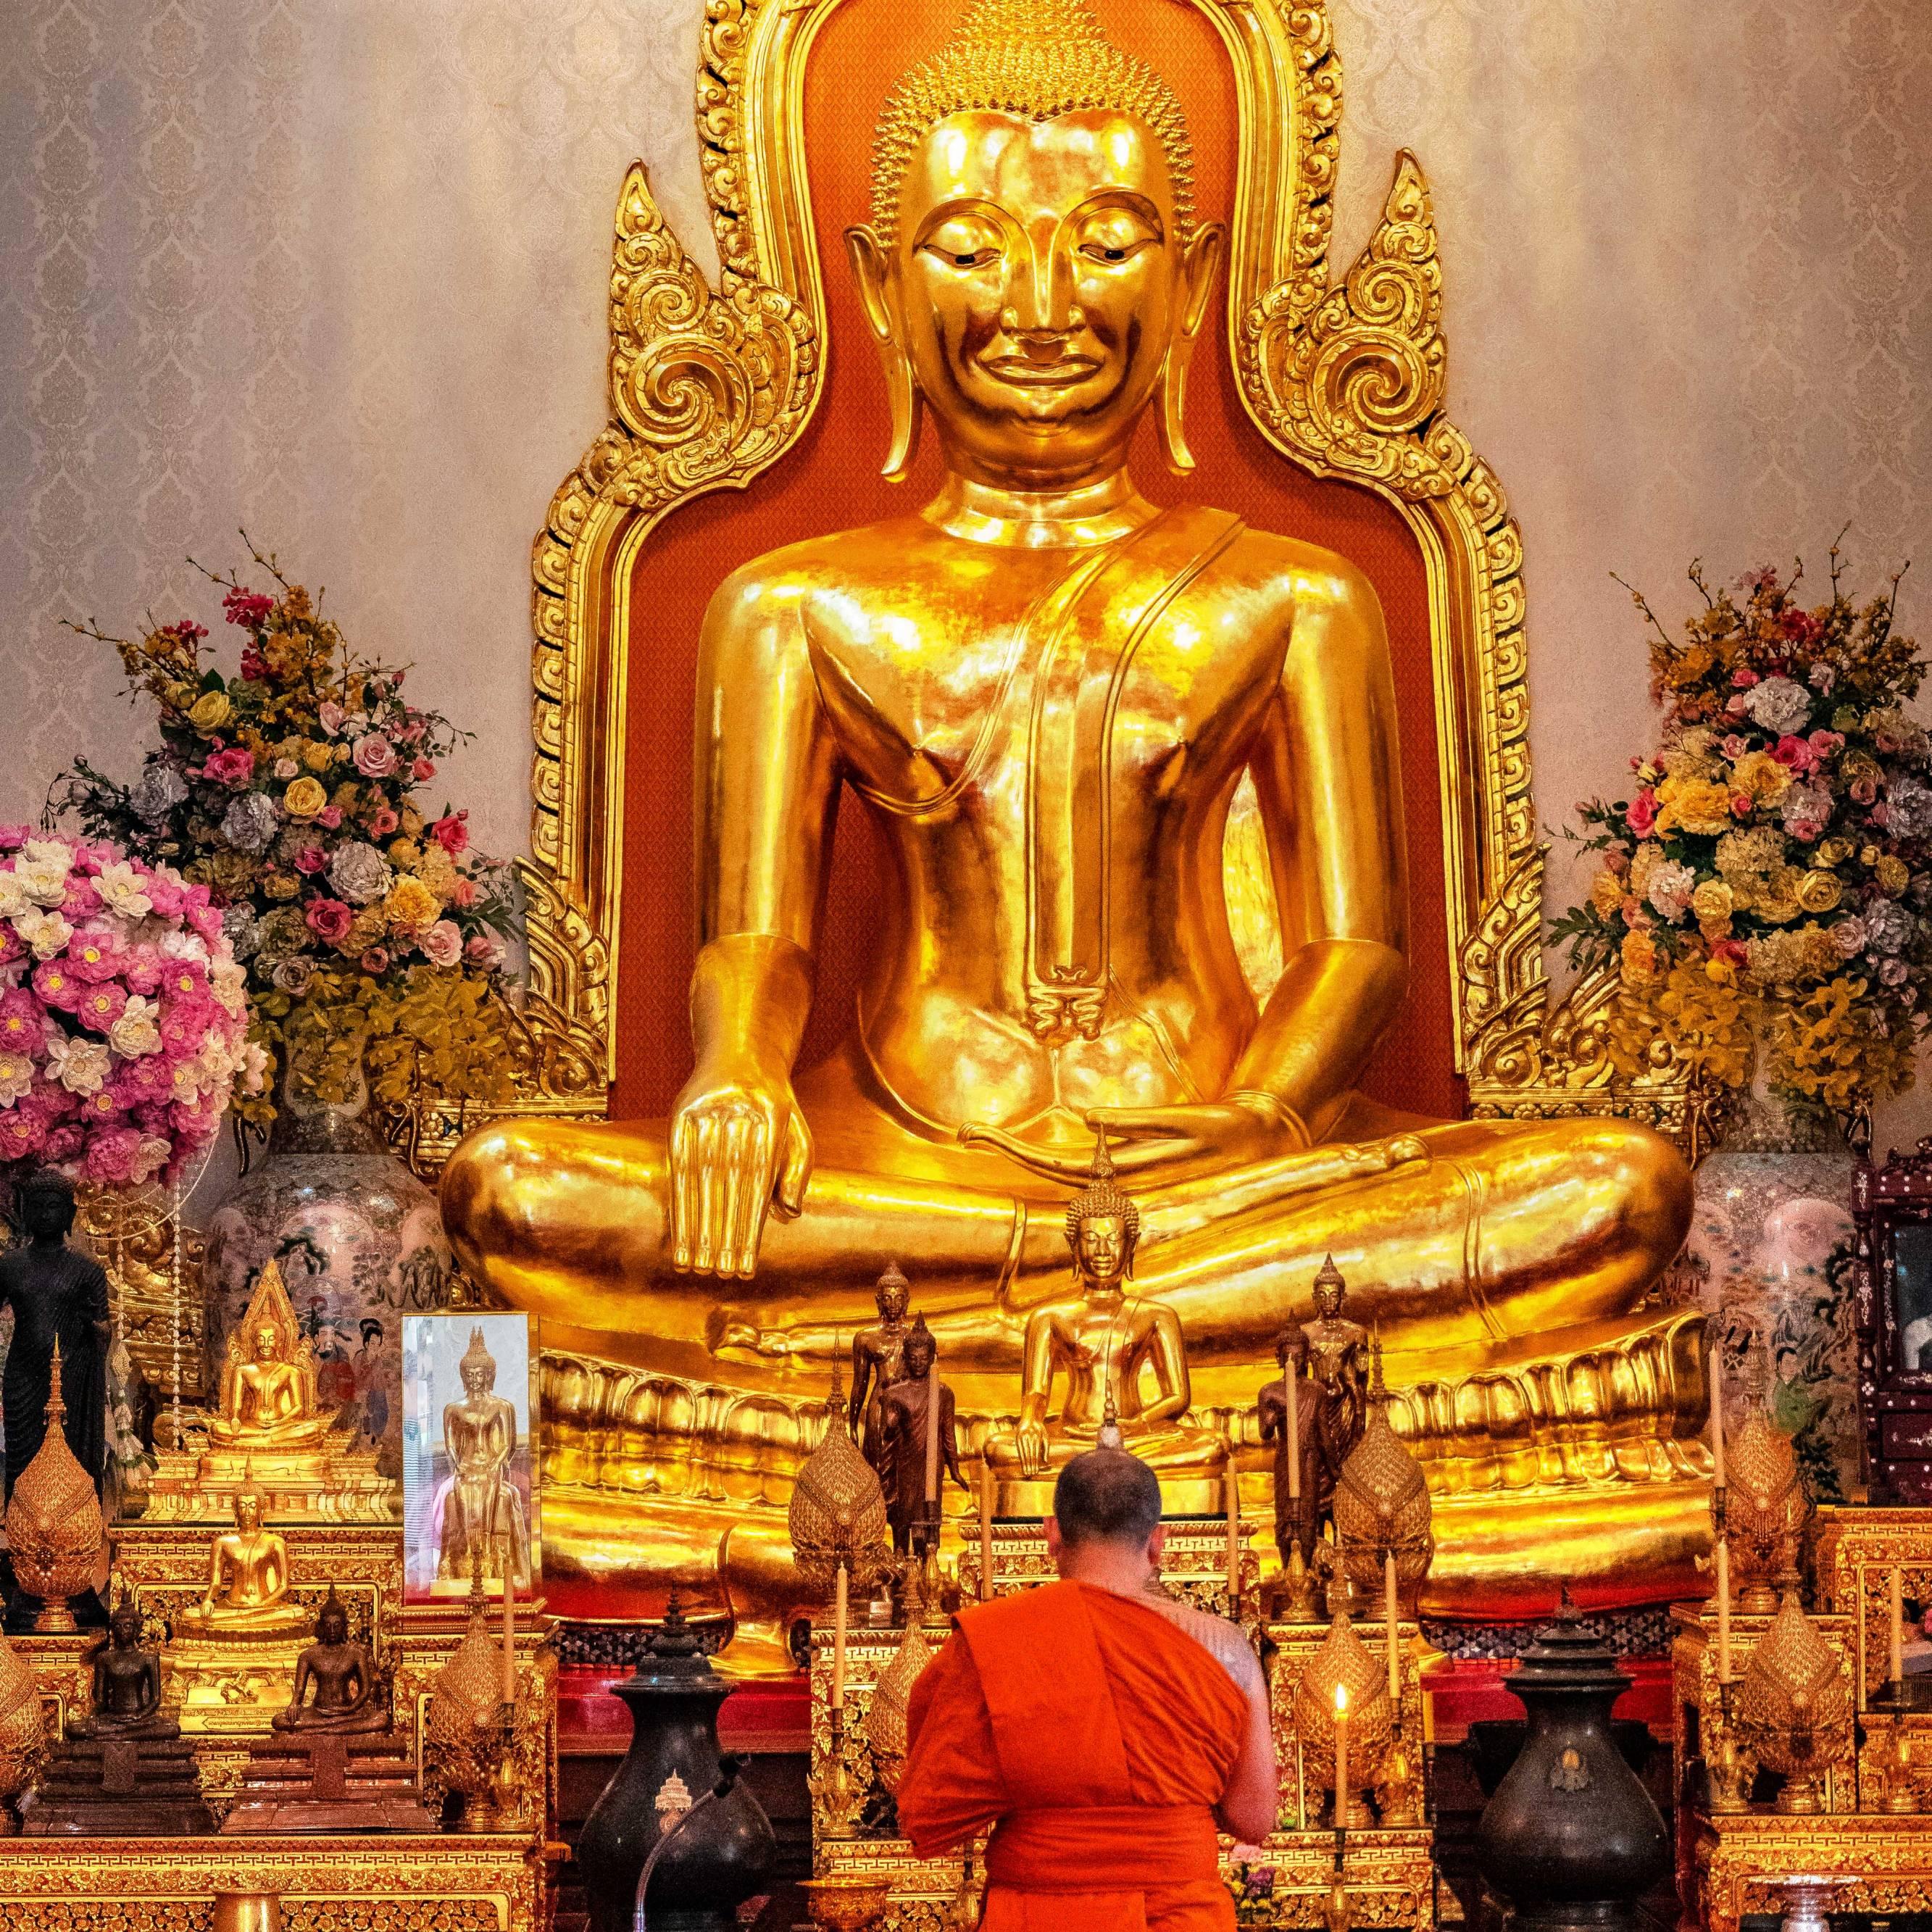 THE GOLDEN BUDDHA TEMPLE, BANGKOK